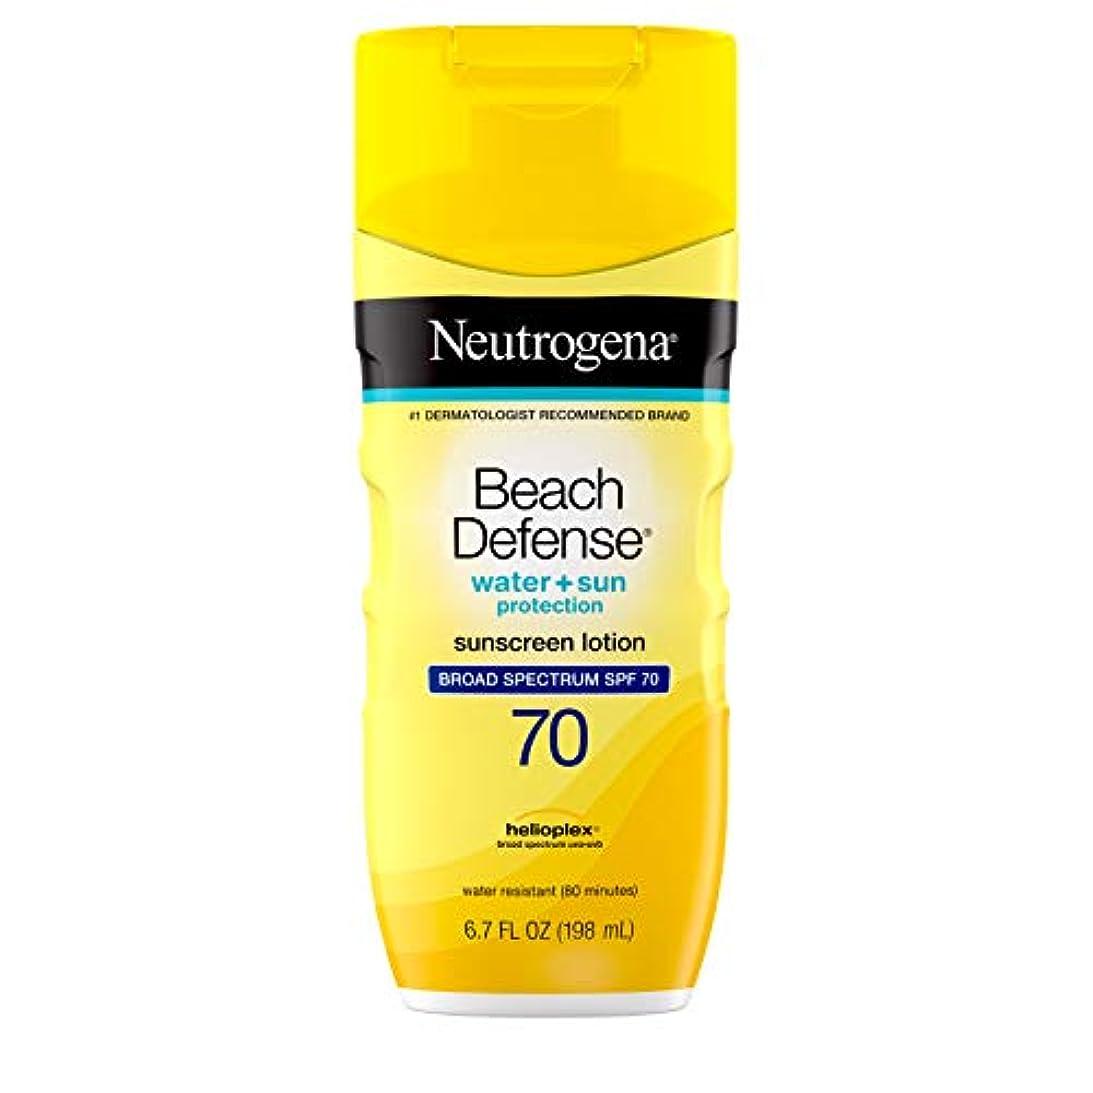 奴隷ループ拮抗する海外直送品Neutrogena Neutrogena Beach Defense Lotion SPF 70, 6.7 oz